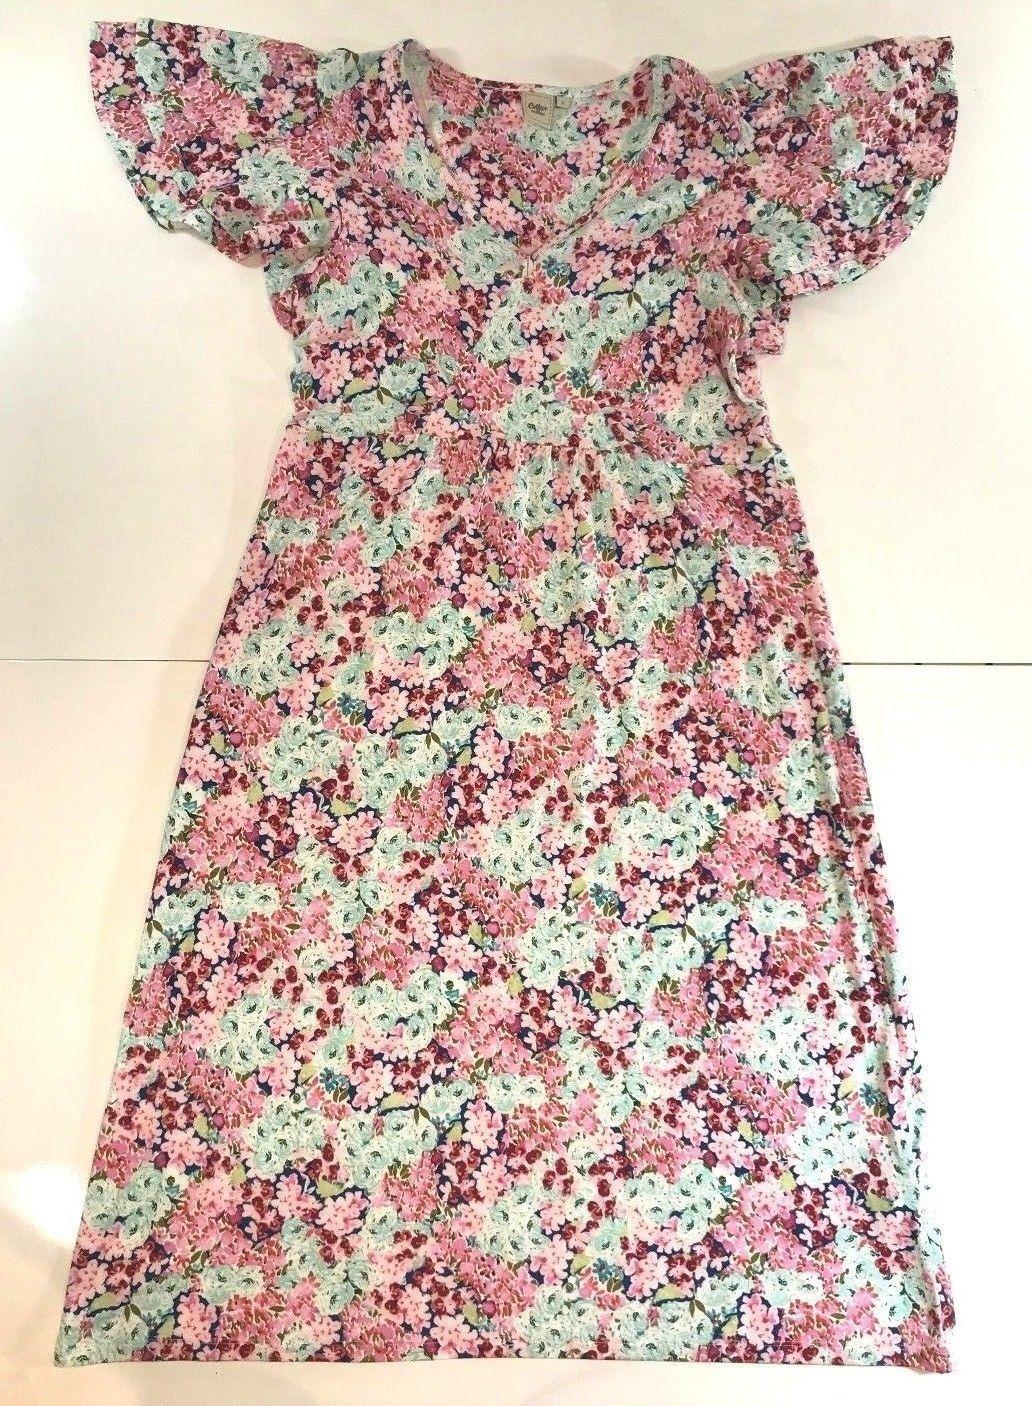 Ladies Cotton Traders Colourful Vintage Styled Floral Summer Dress Uk Size 12 Summer Dresses Dresses Floral Dress Summer [ 1406 x 1032 Pixel ]